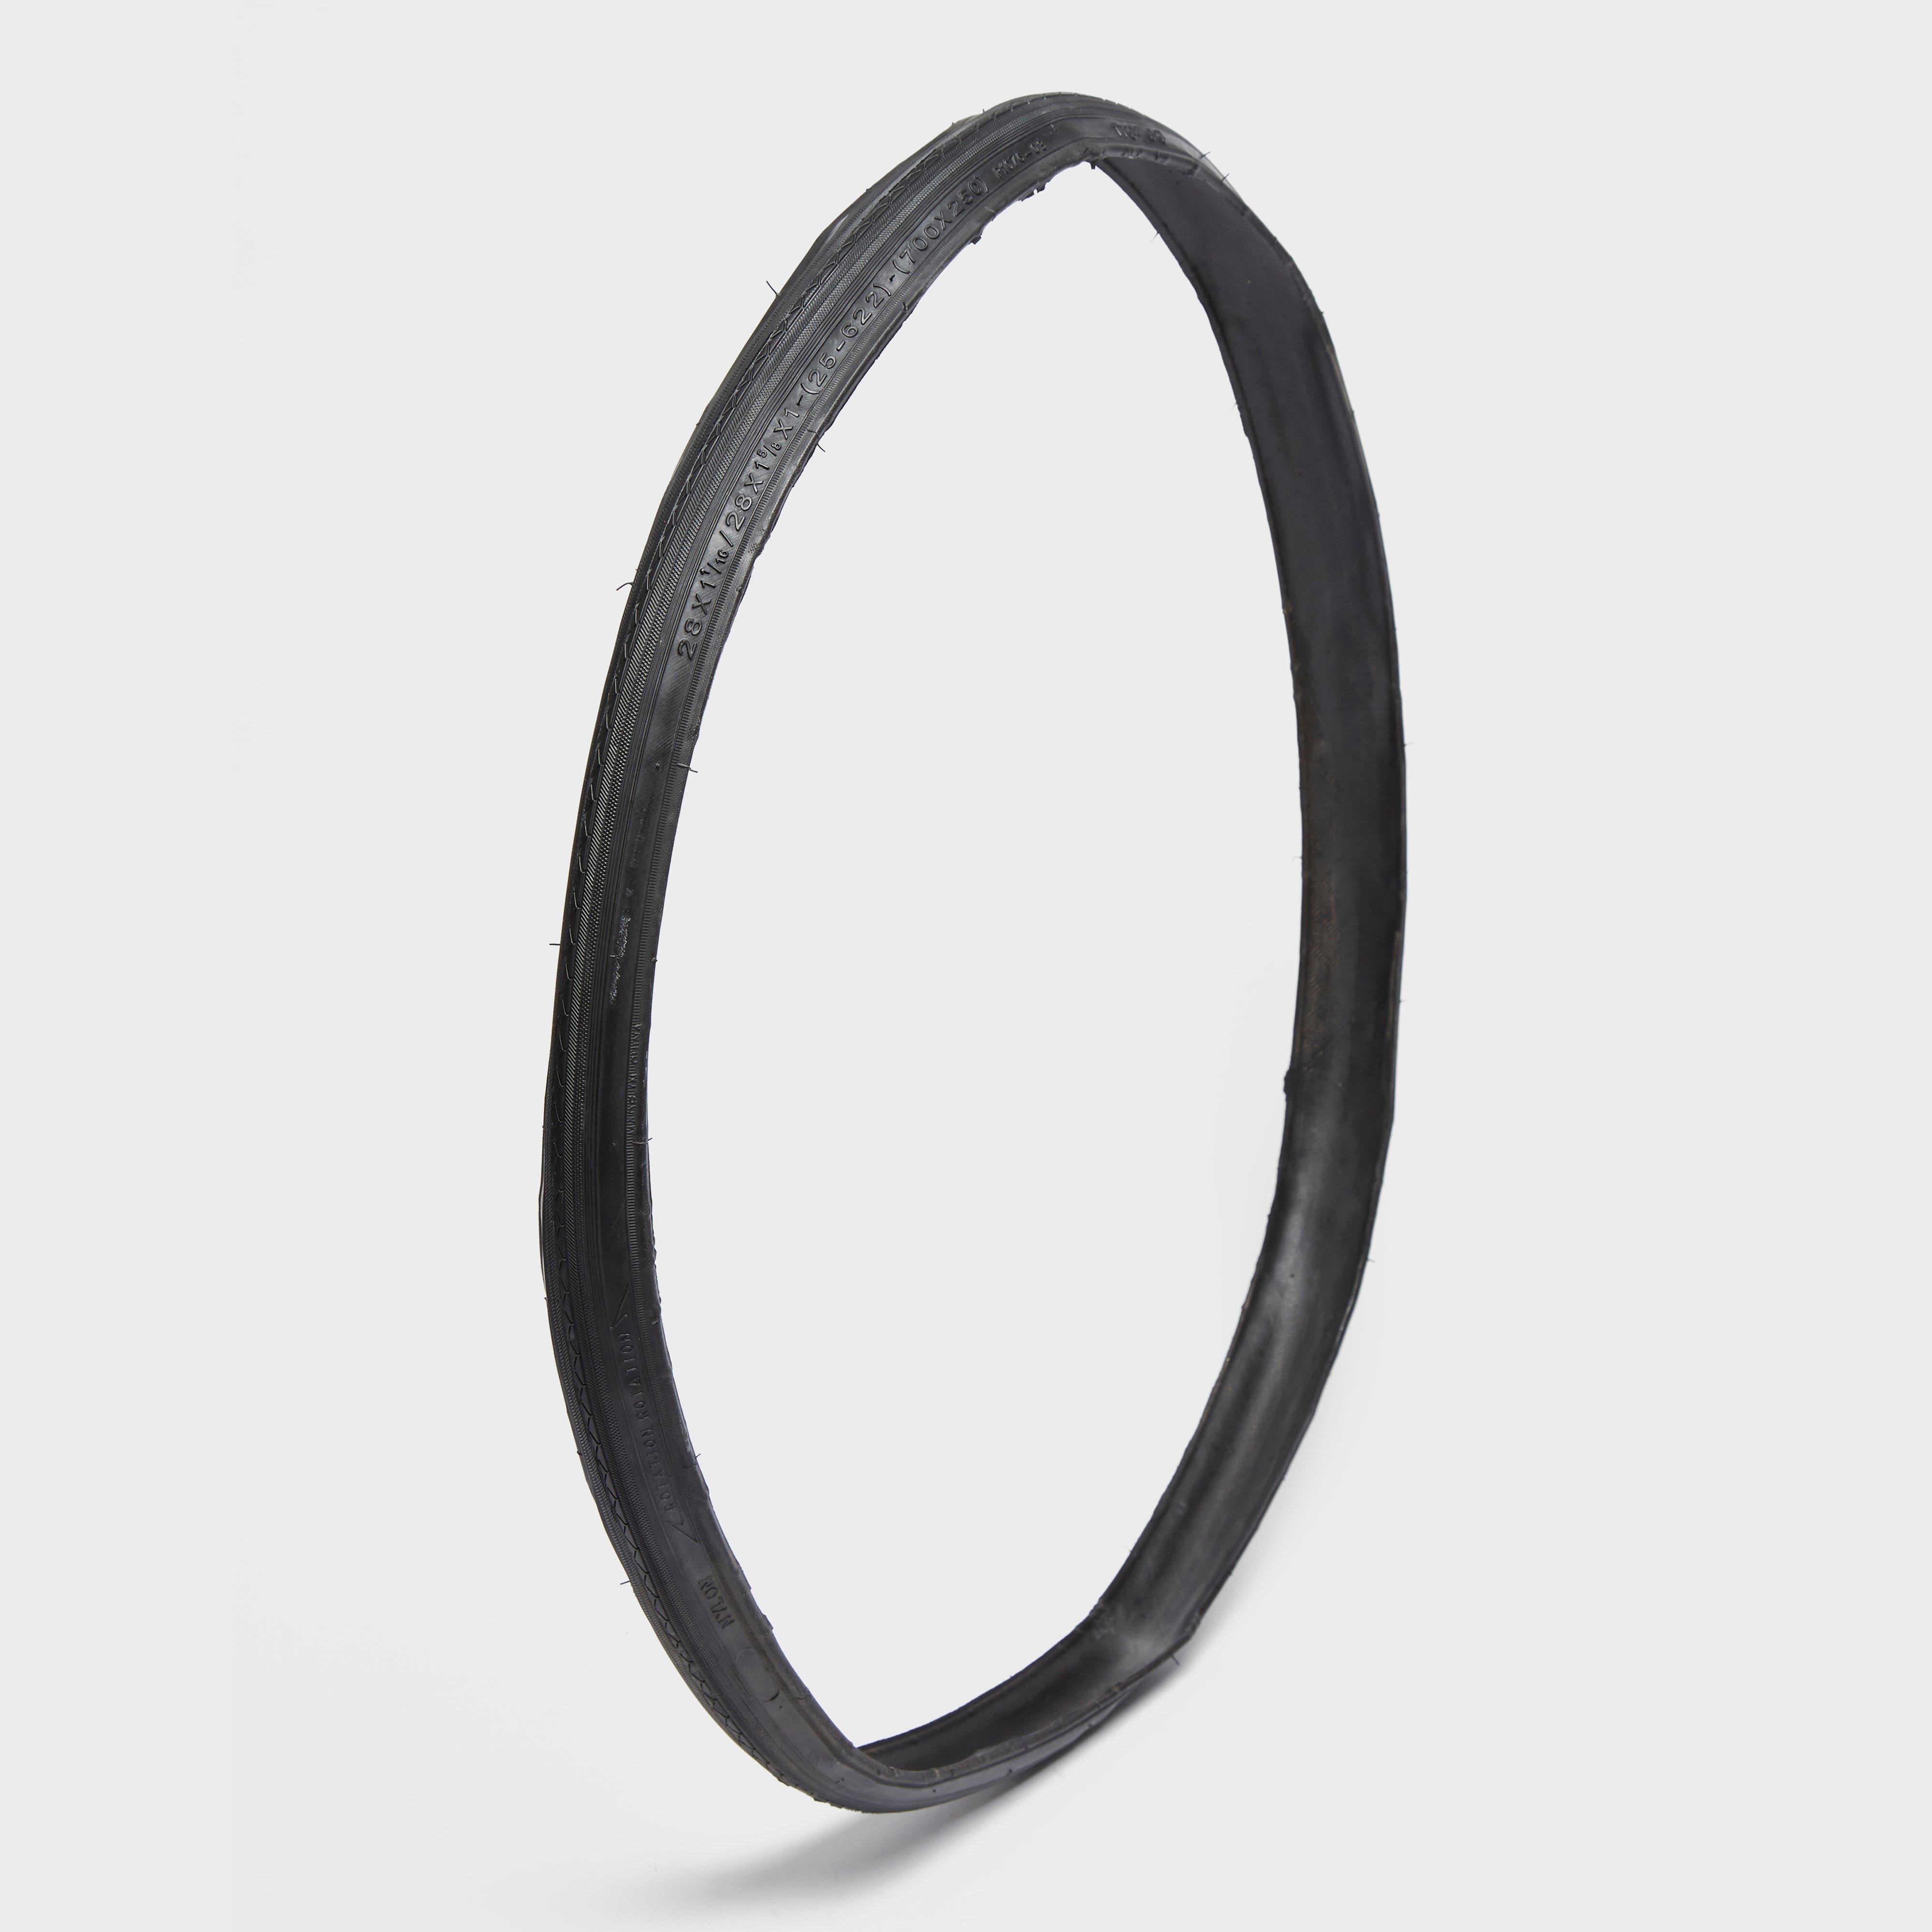 One23 700 X 25 Folding Road Bike Tyre - Black/road  Black/road